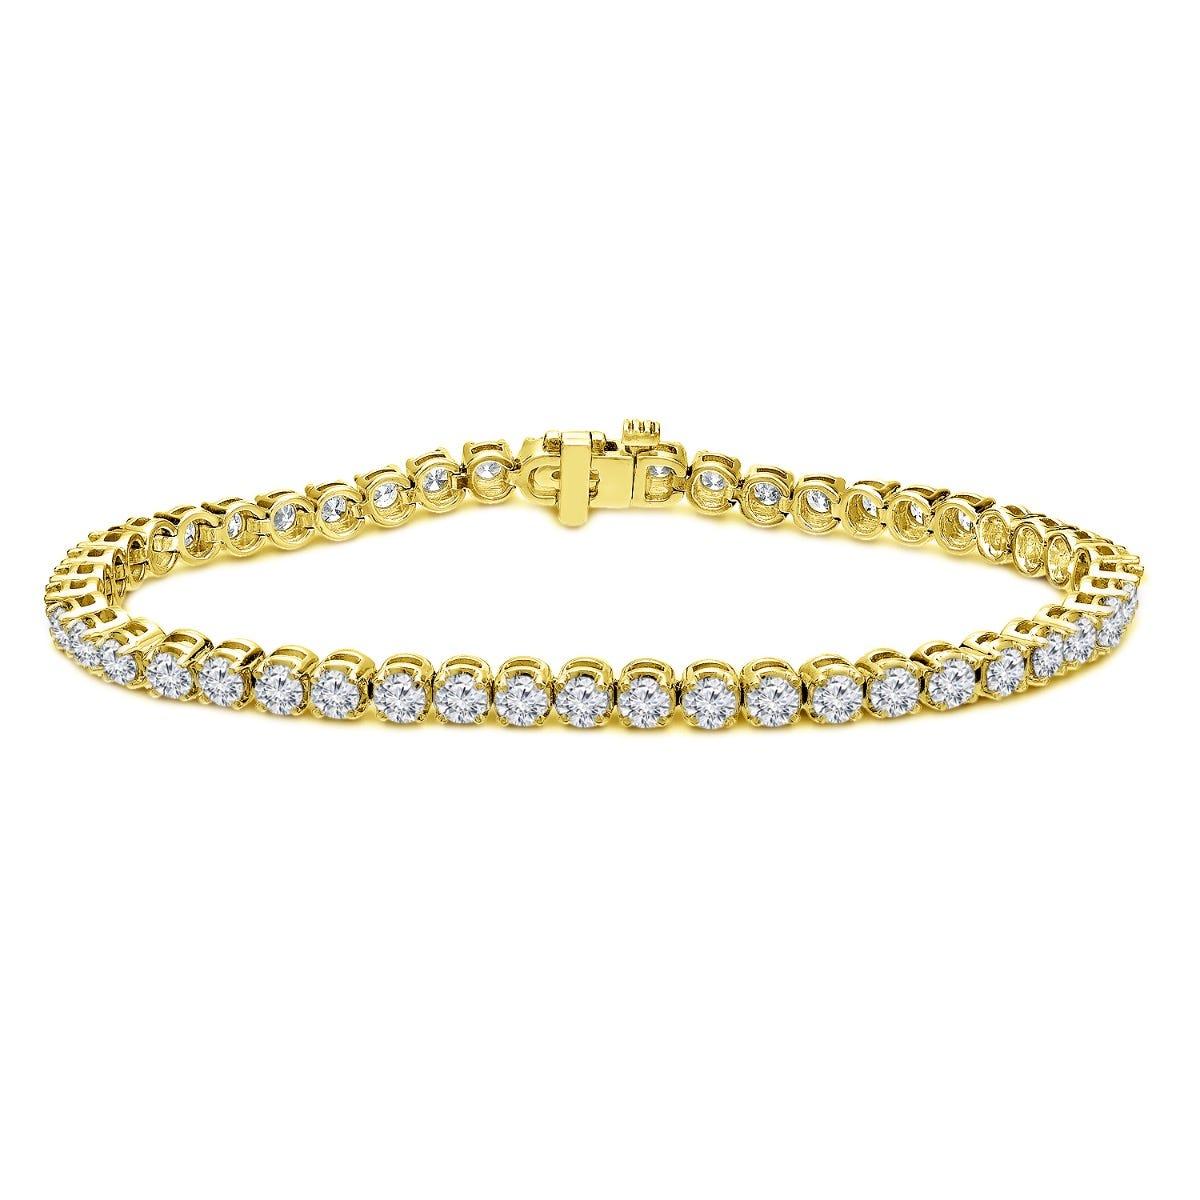 4ctw. 4-Prong Round Link Diamond Tennis Bracelet in 14K Yellow Gold (HI, VS1-VS2, 52-Stone)